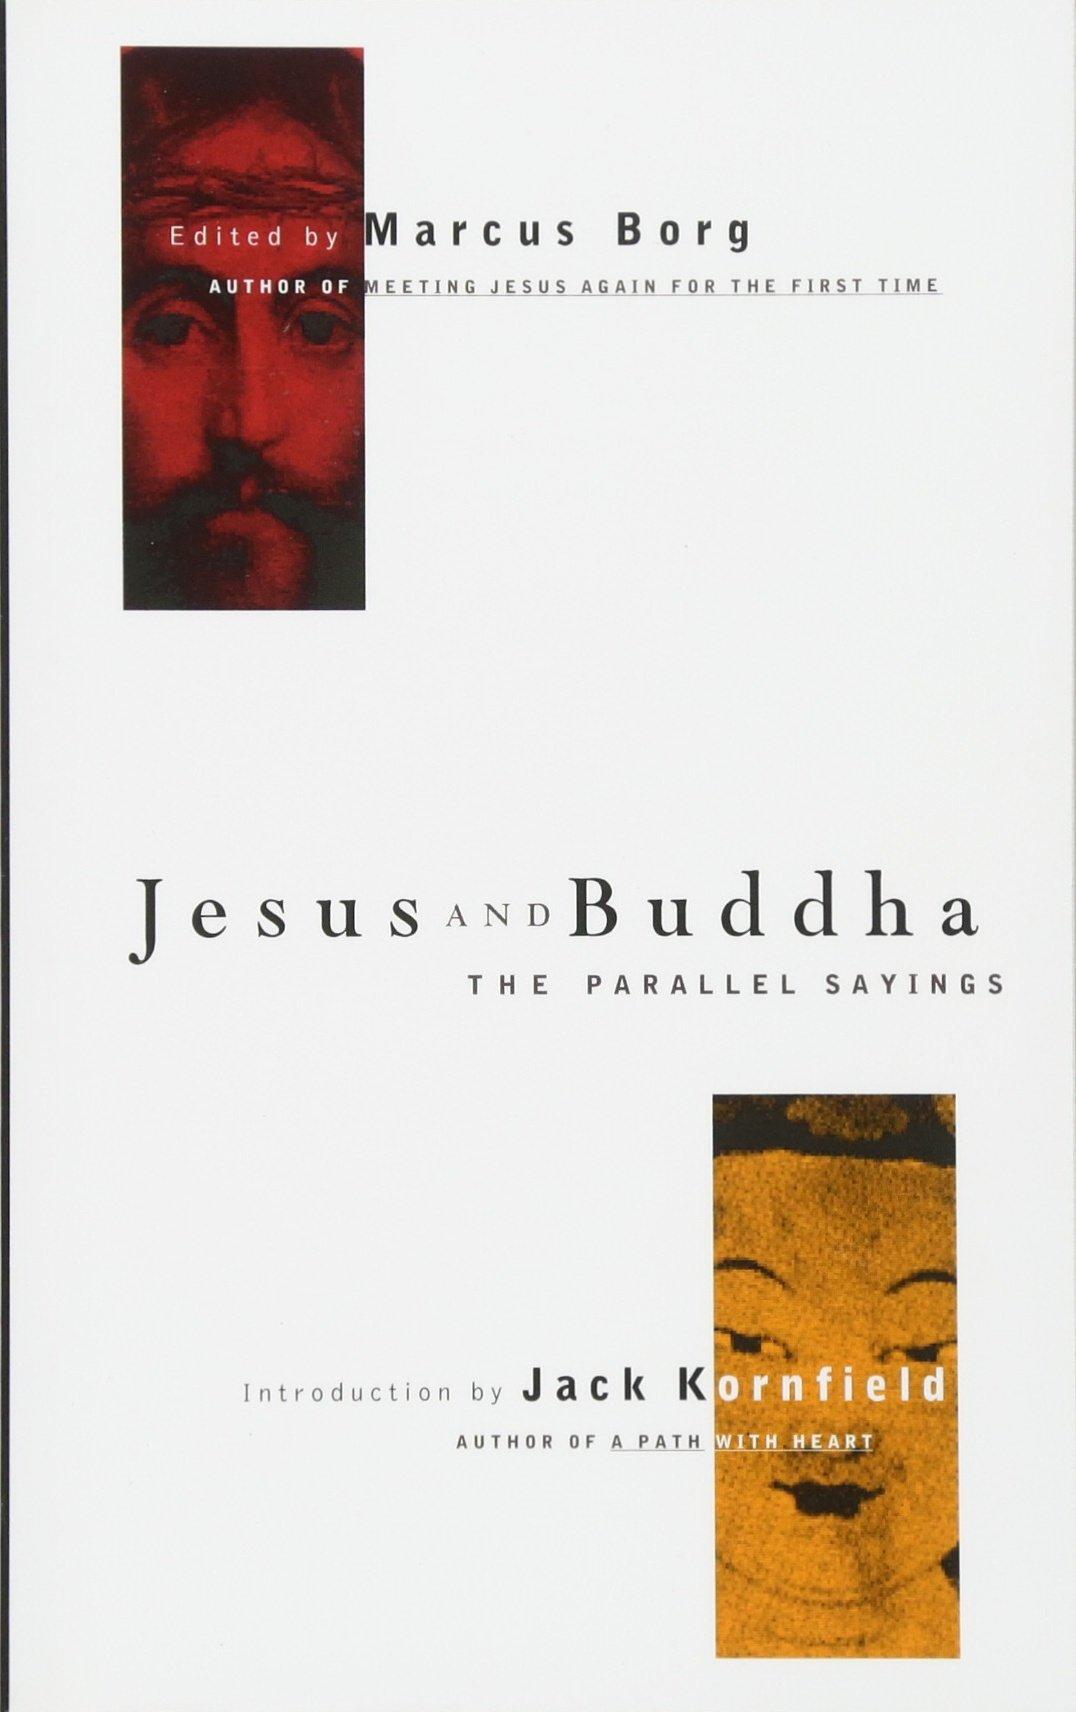 Jesus and Buddha: The Parallel Sayings (Seastone) pdf